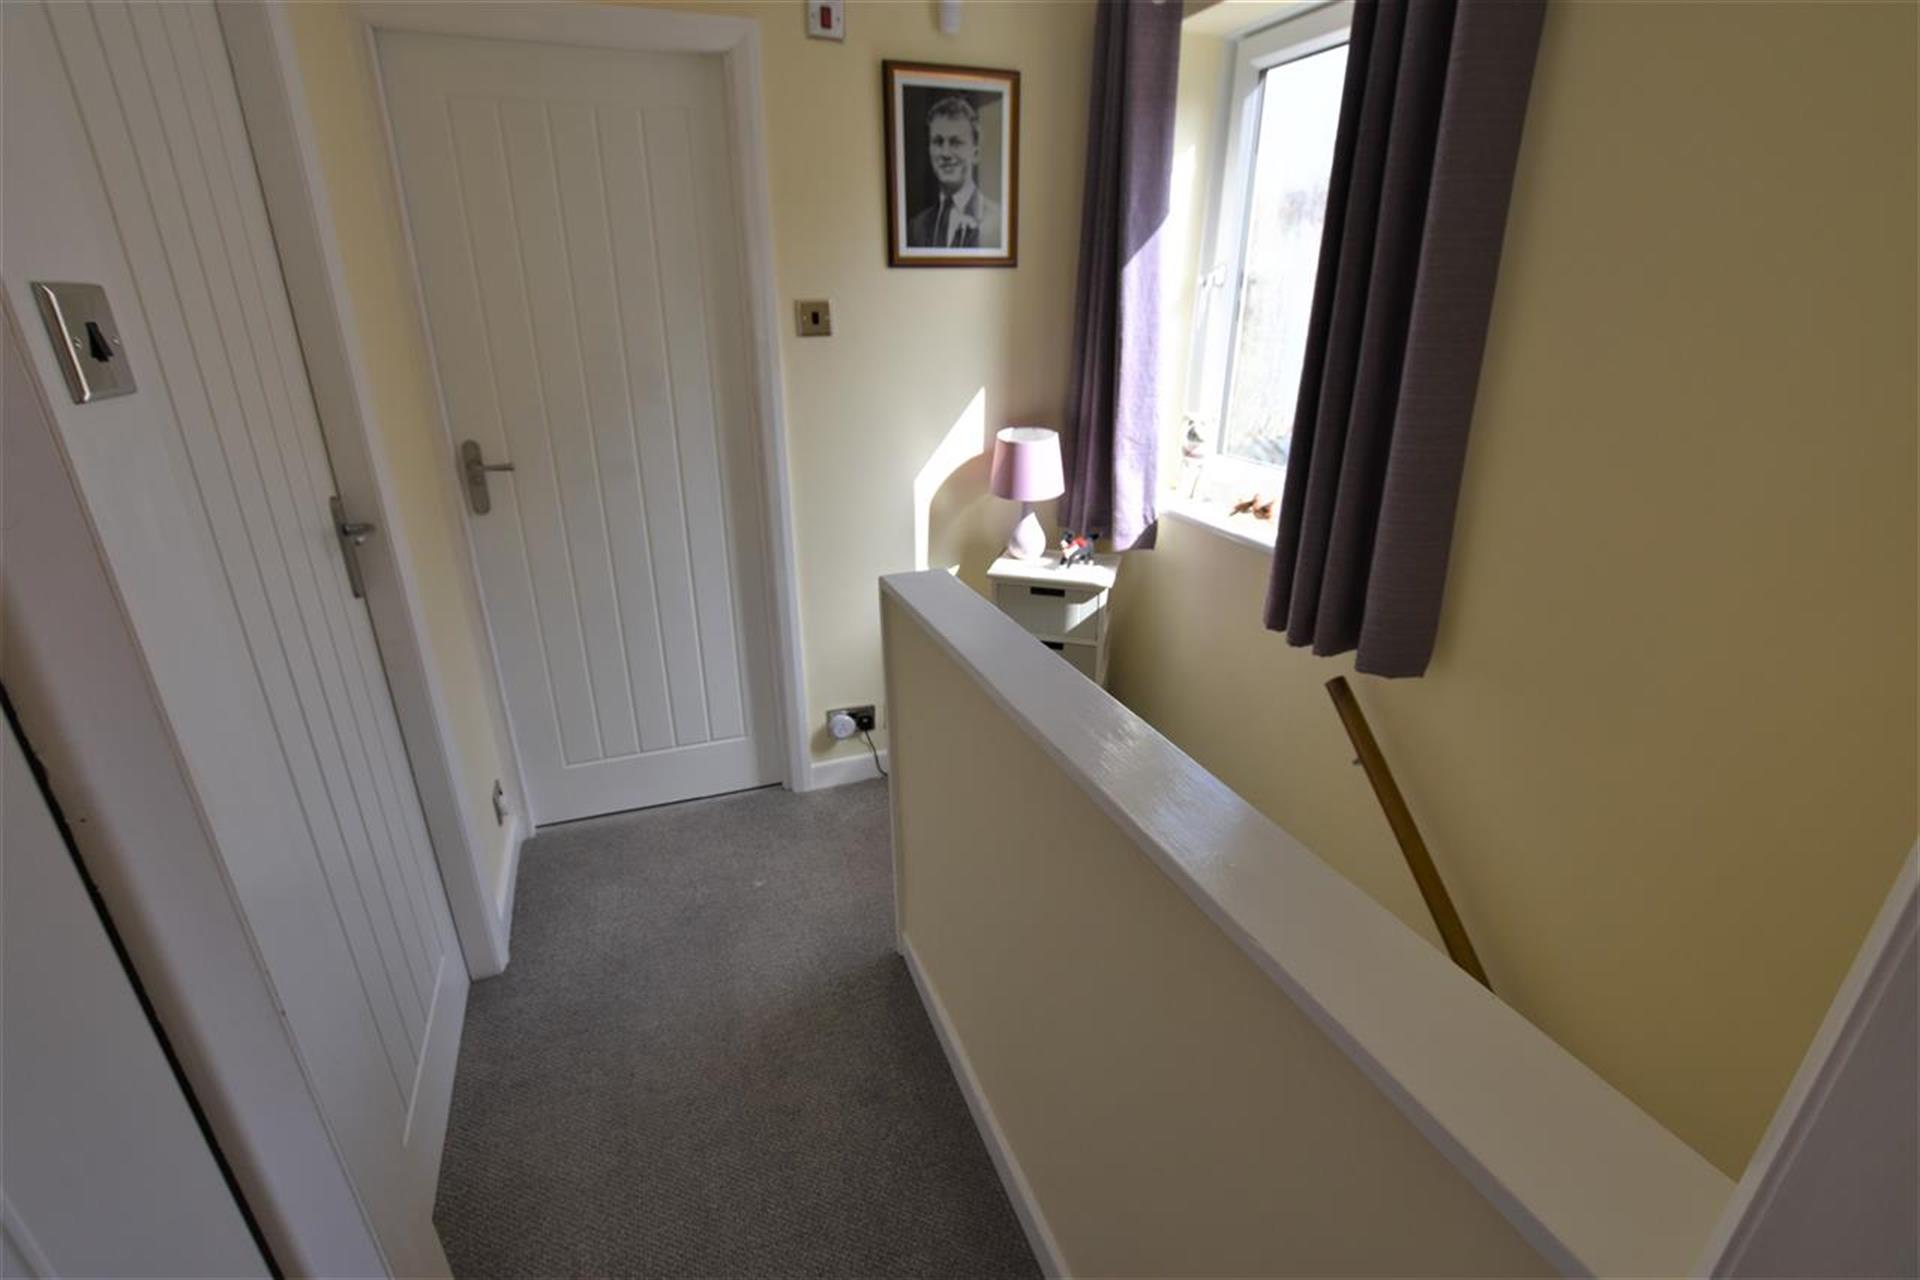 3 Bedroom Semi-detached House For Sale - Hallway